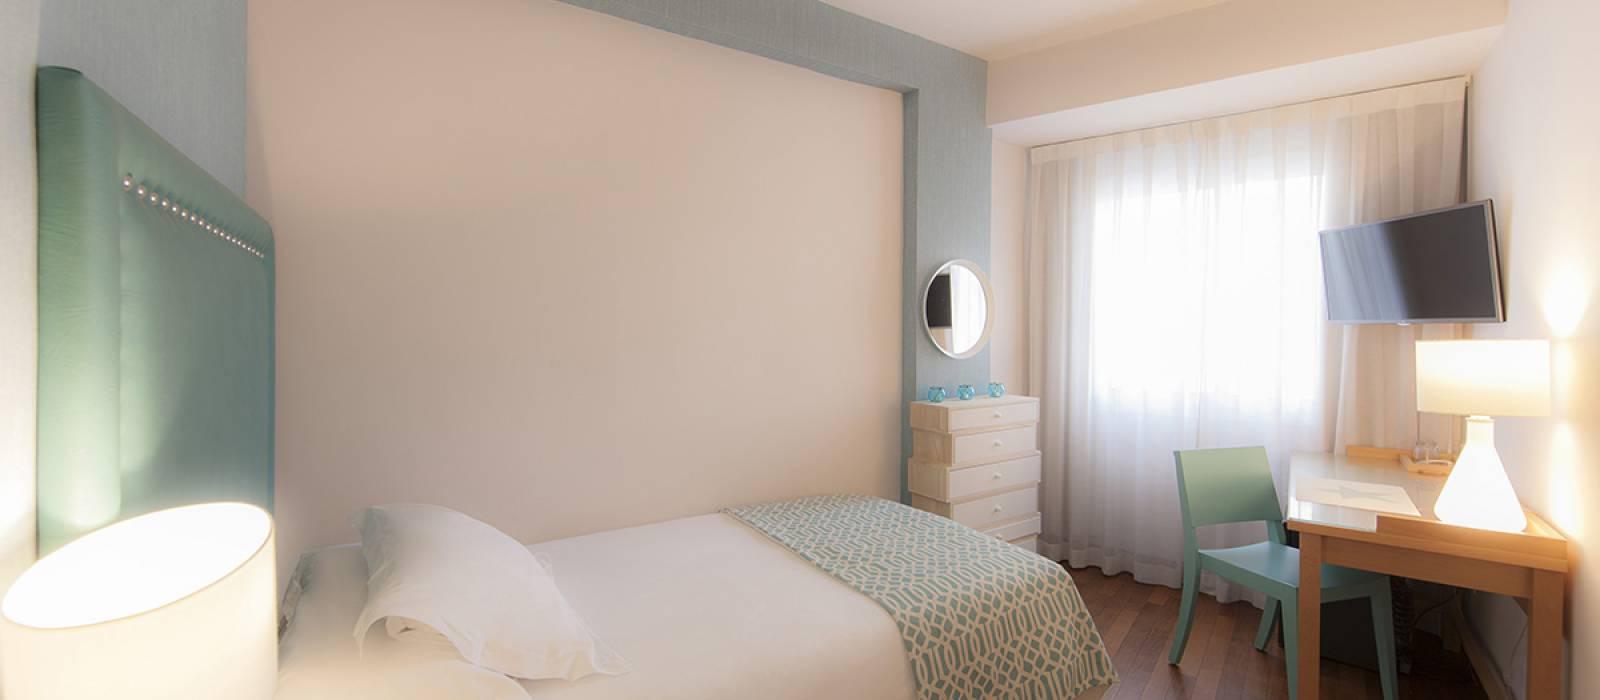 Soma Zimmer Hotel Vincci Madrid - Vincci XS - Zimmer